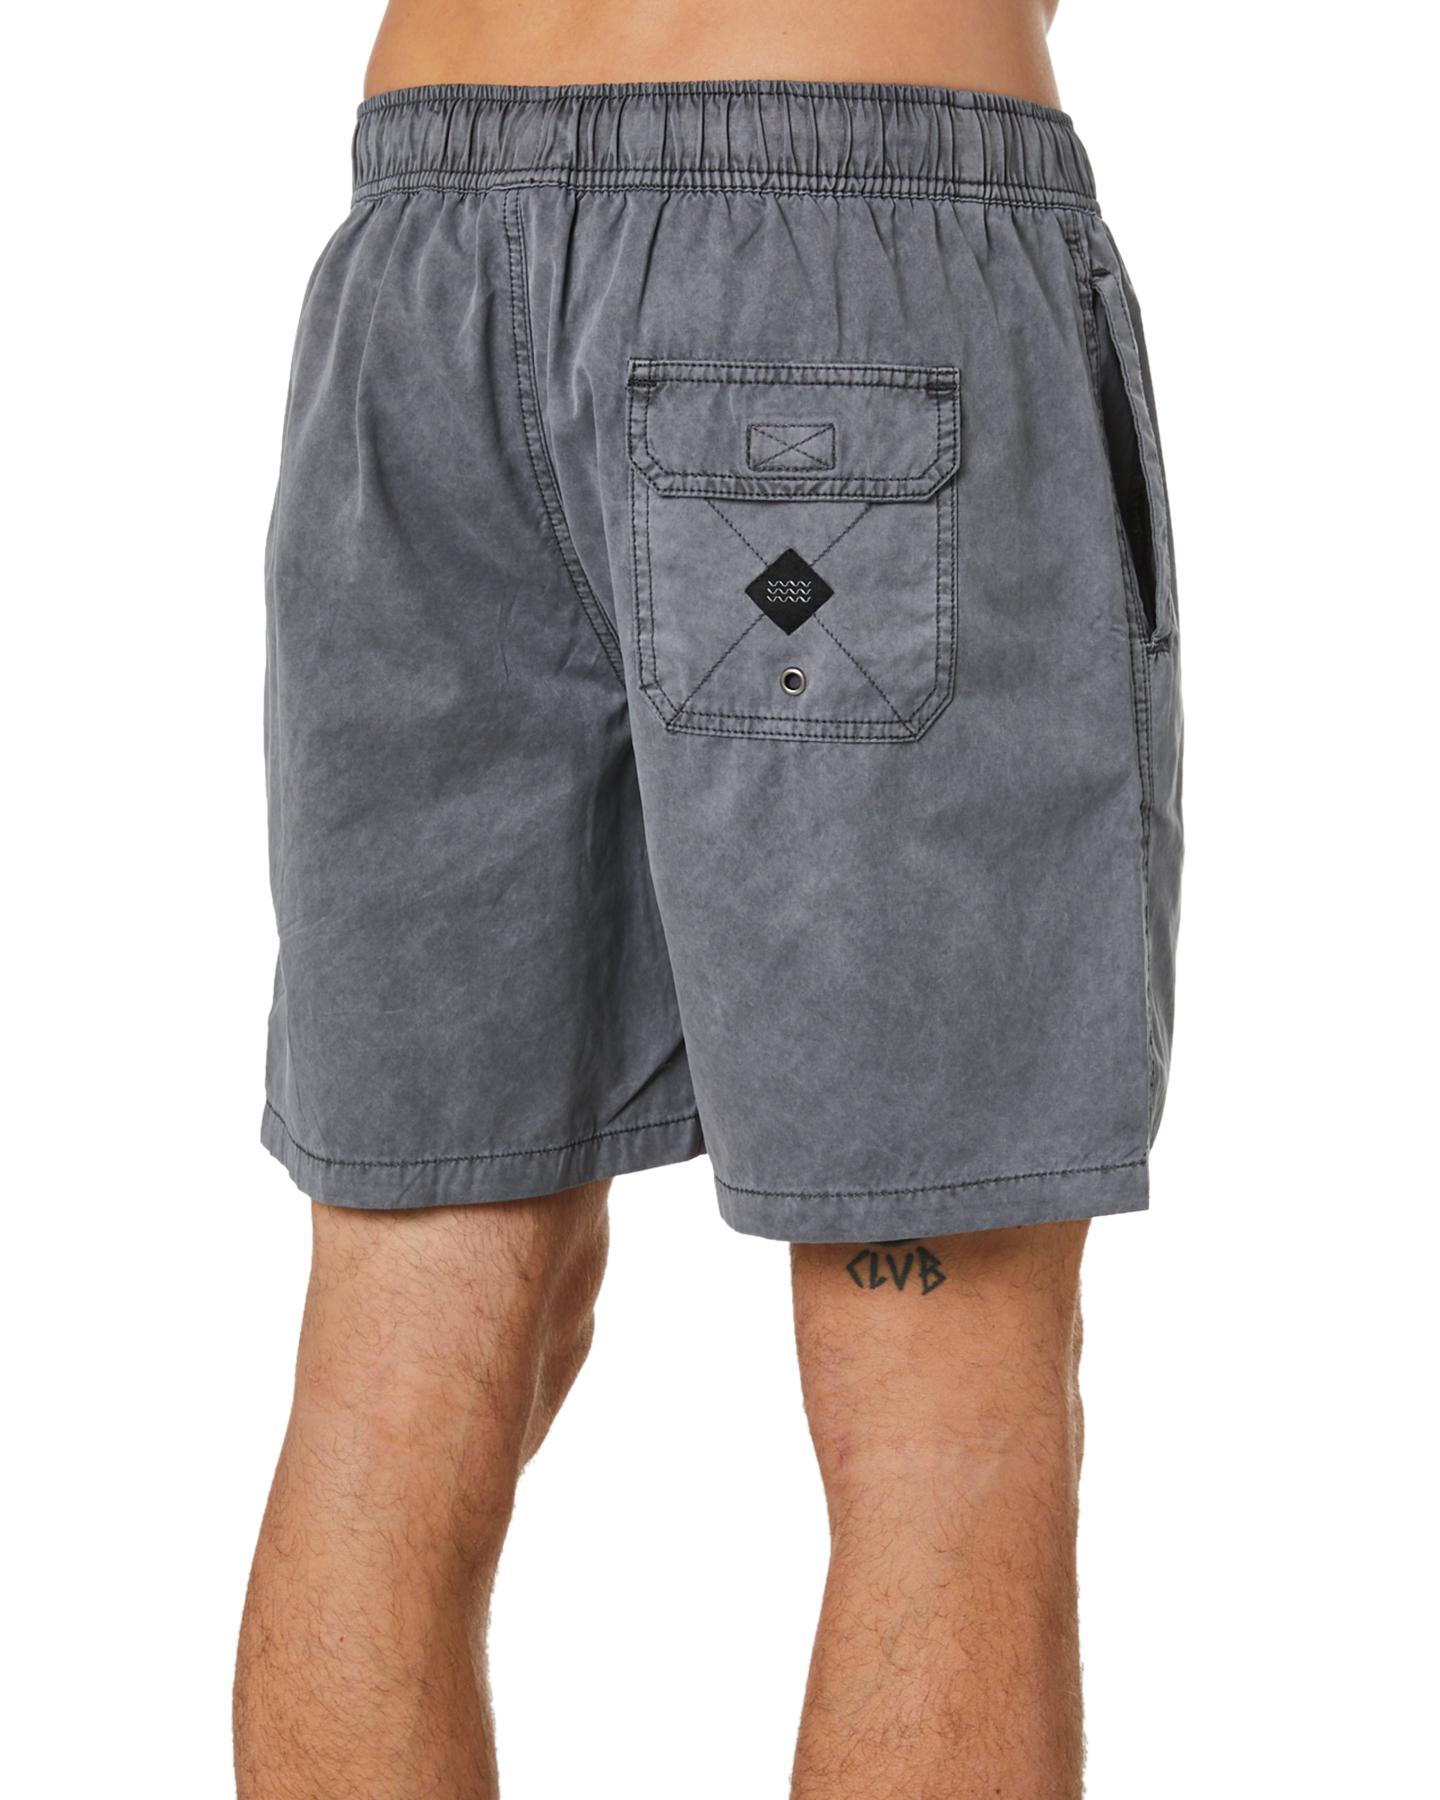 New-Swell-Men-039-s-Malibu-Mens-Beach-Short-Cotton-Polyester-Grey thumbnail 32